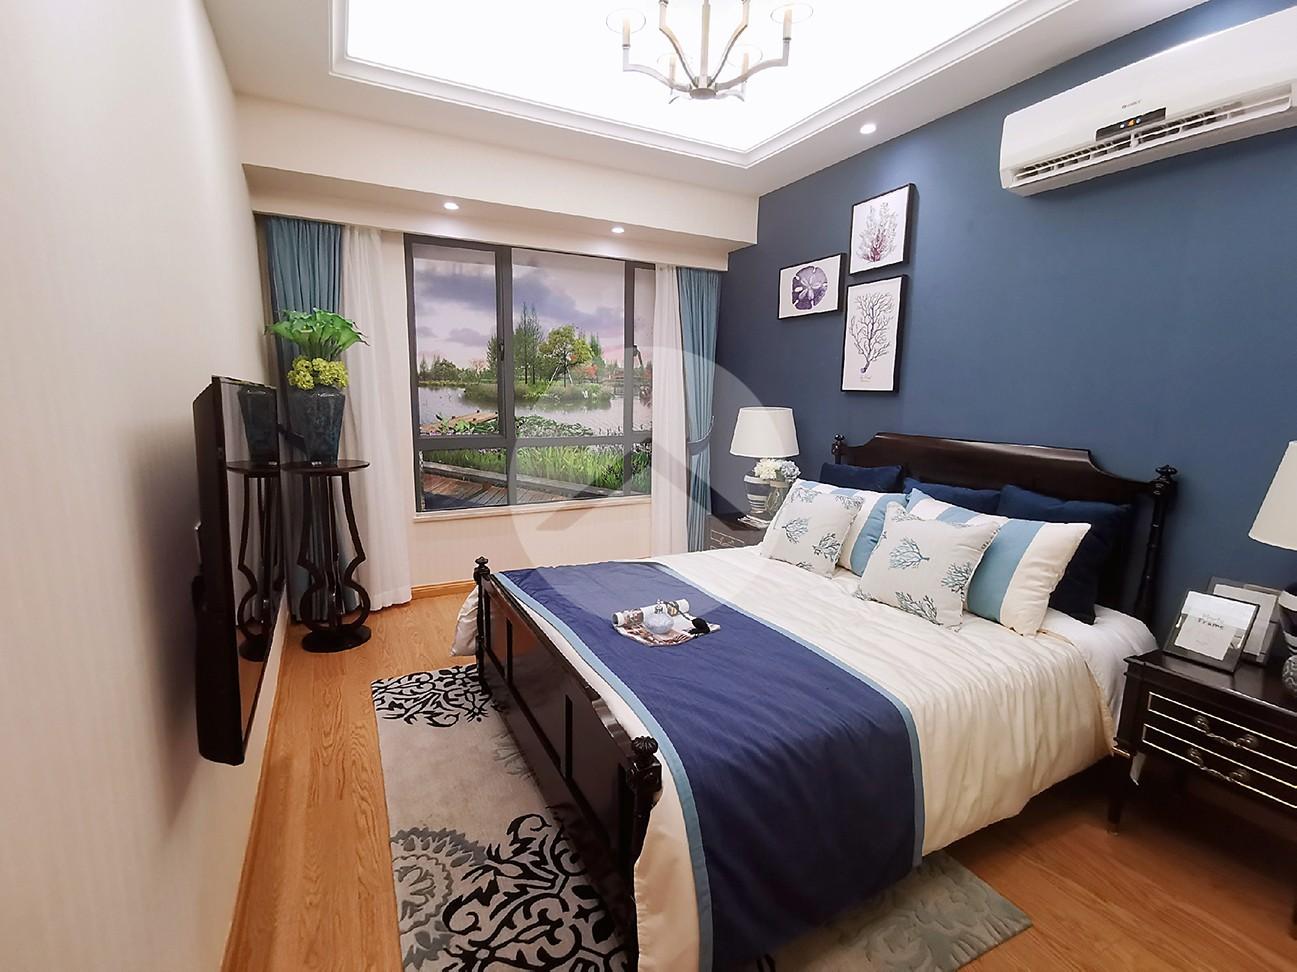 2 Bedroom Condo For Sale - Hun Sen Blvd, Phnom Penh